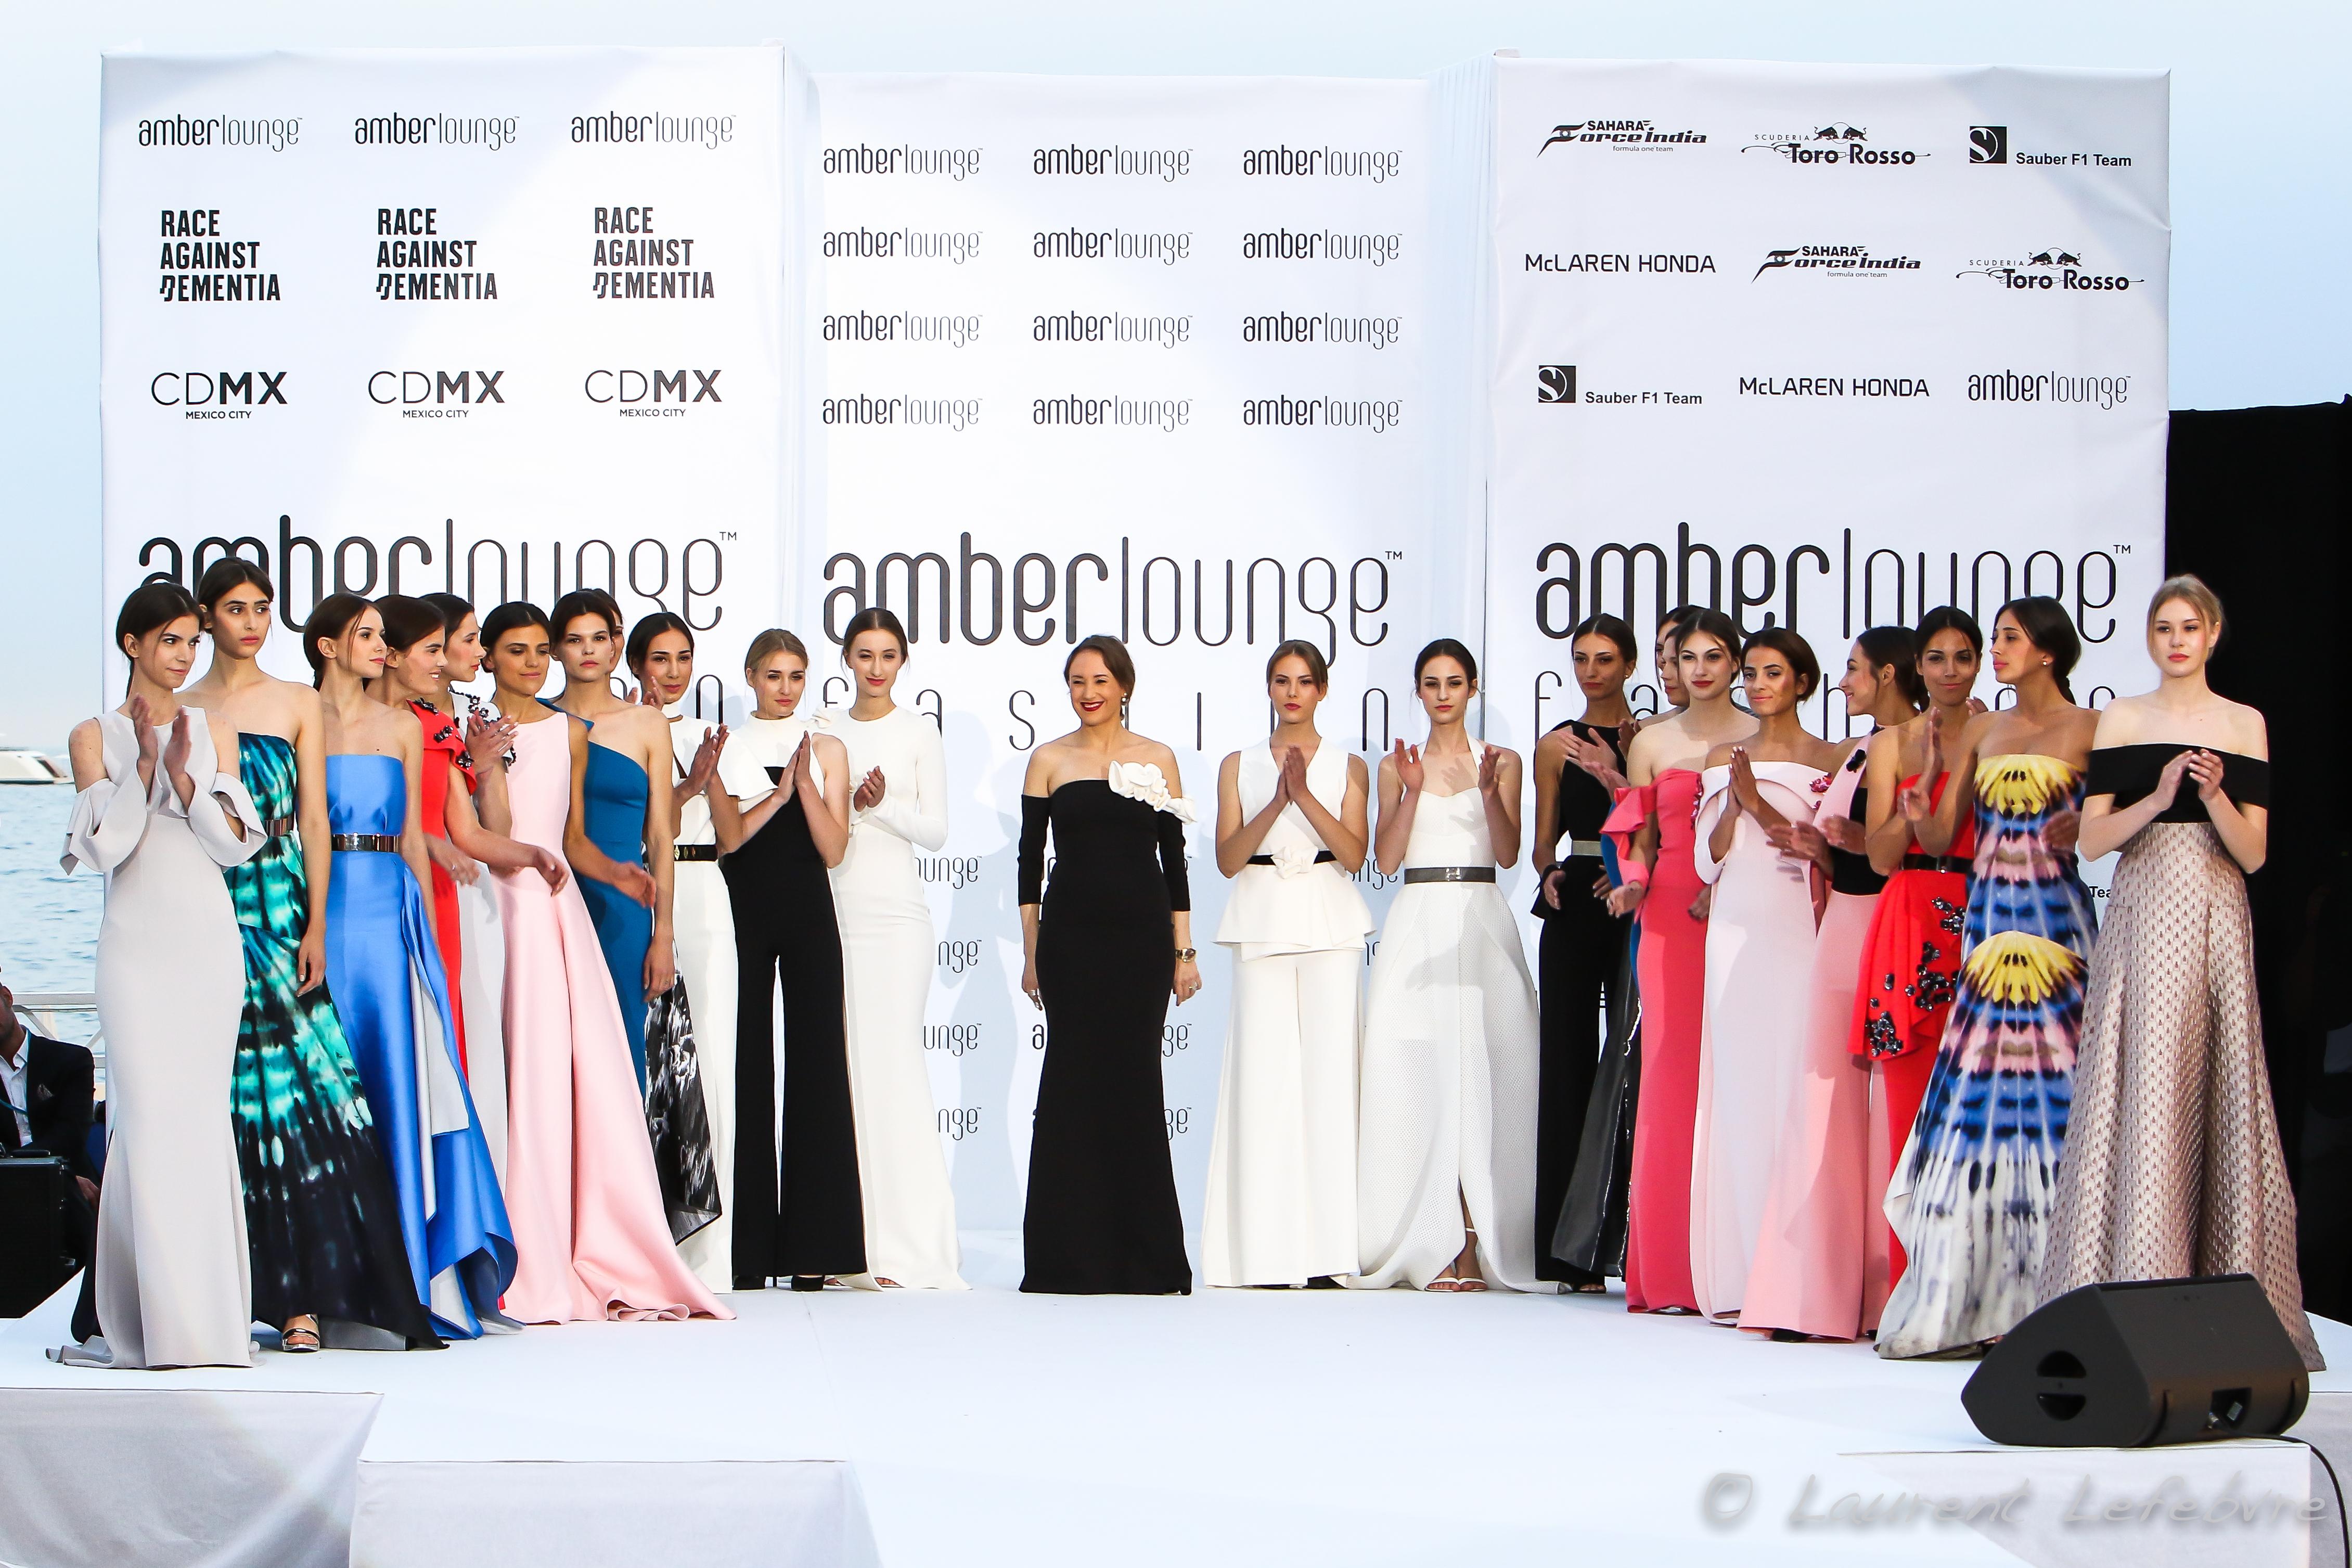 Laurent Lefebvre Fashion Photography